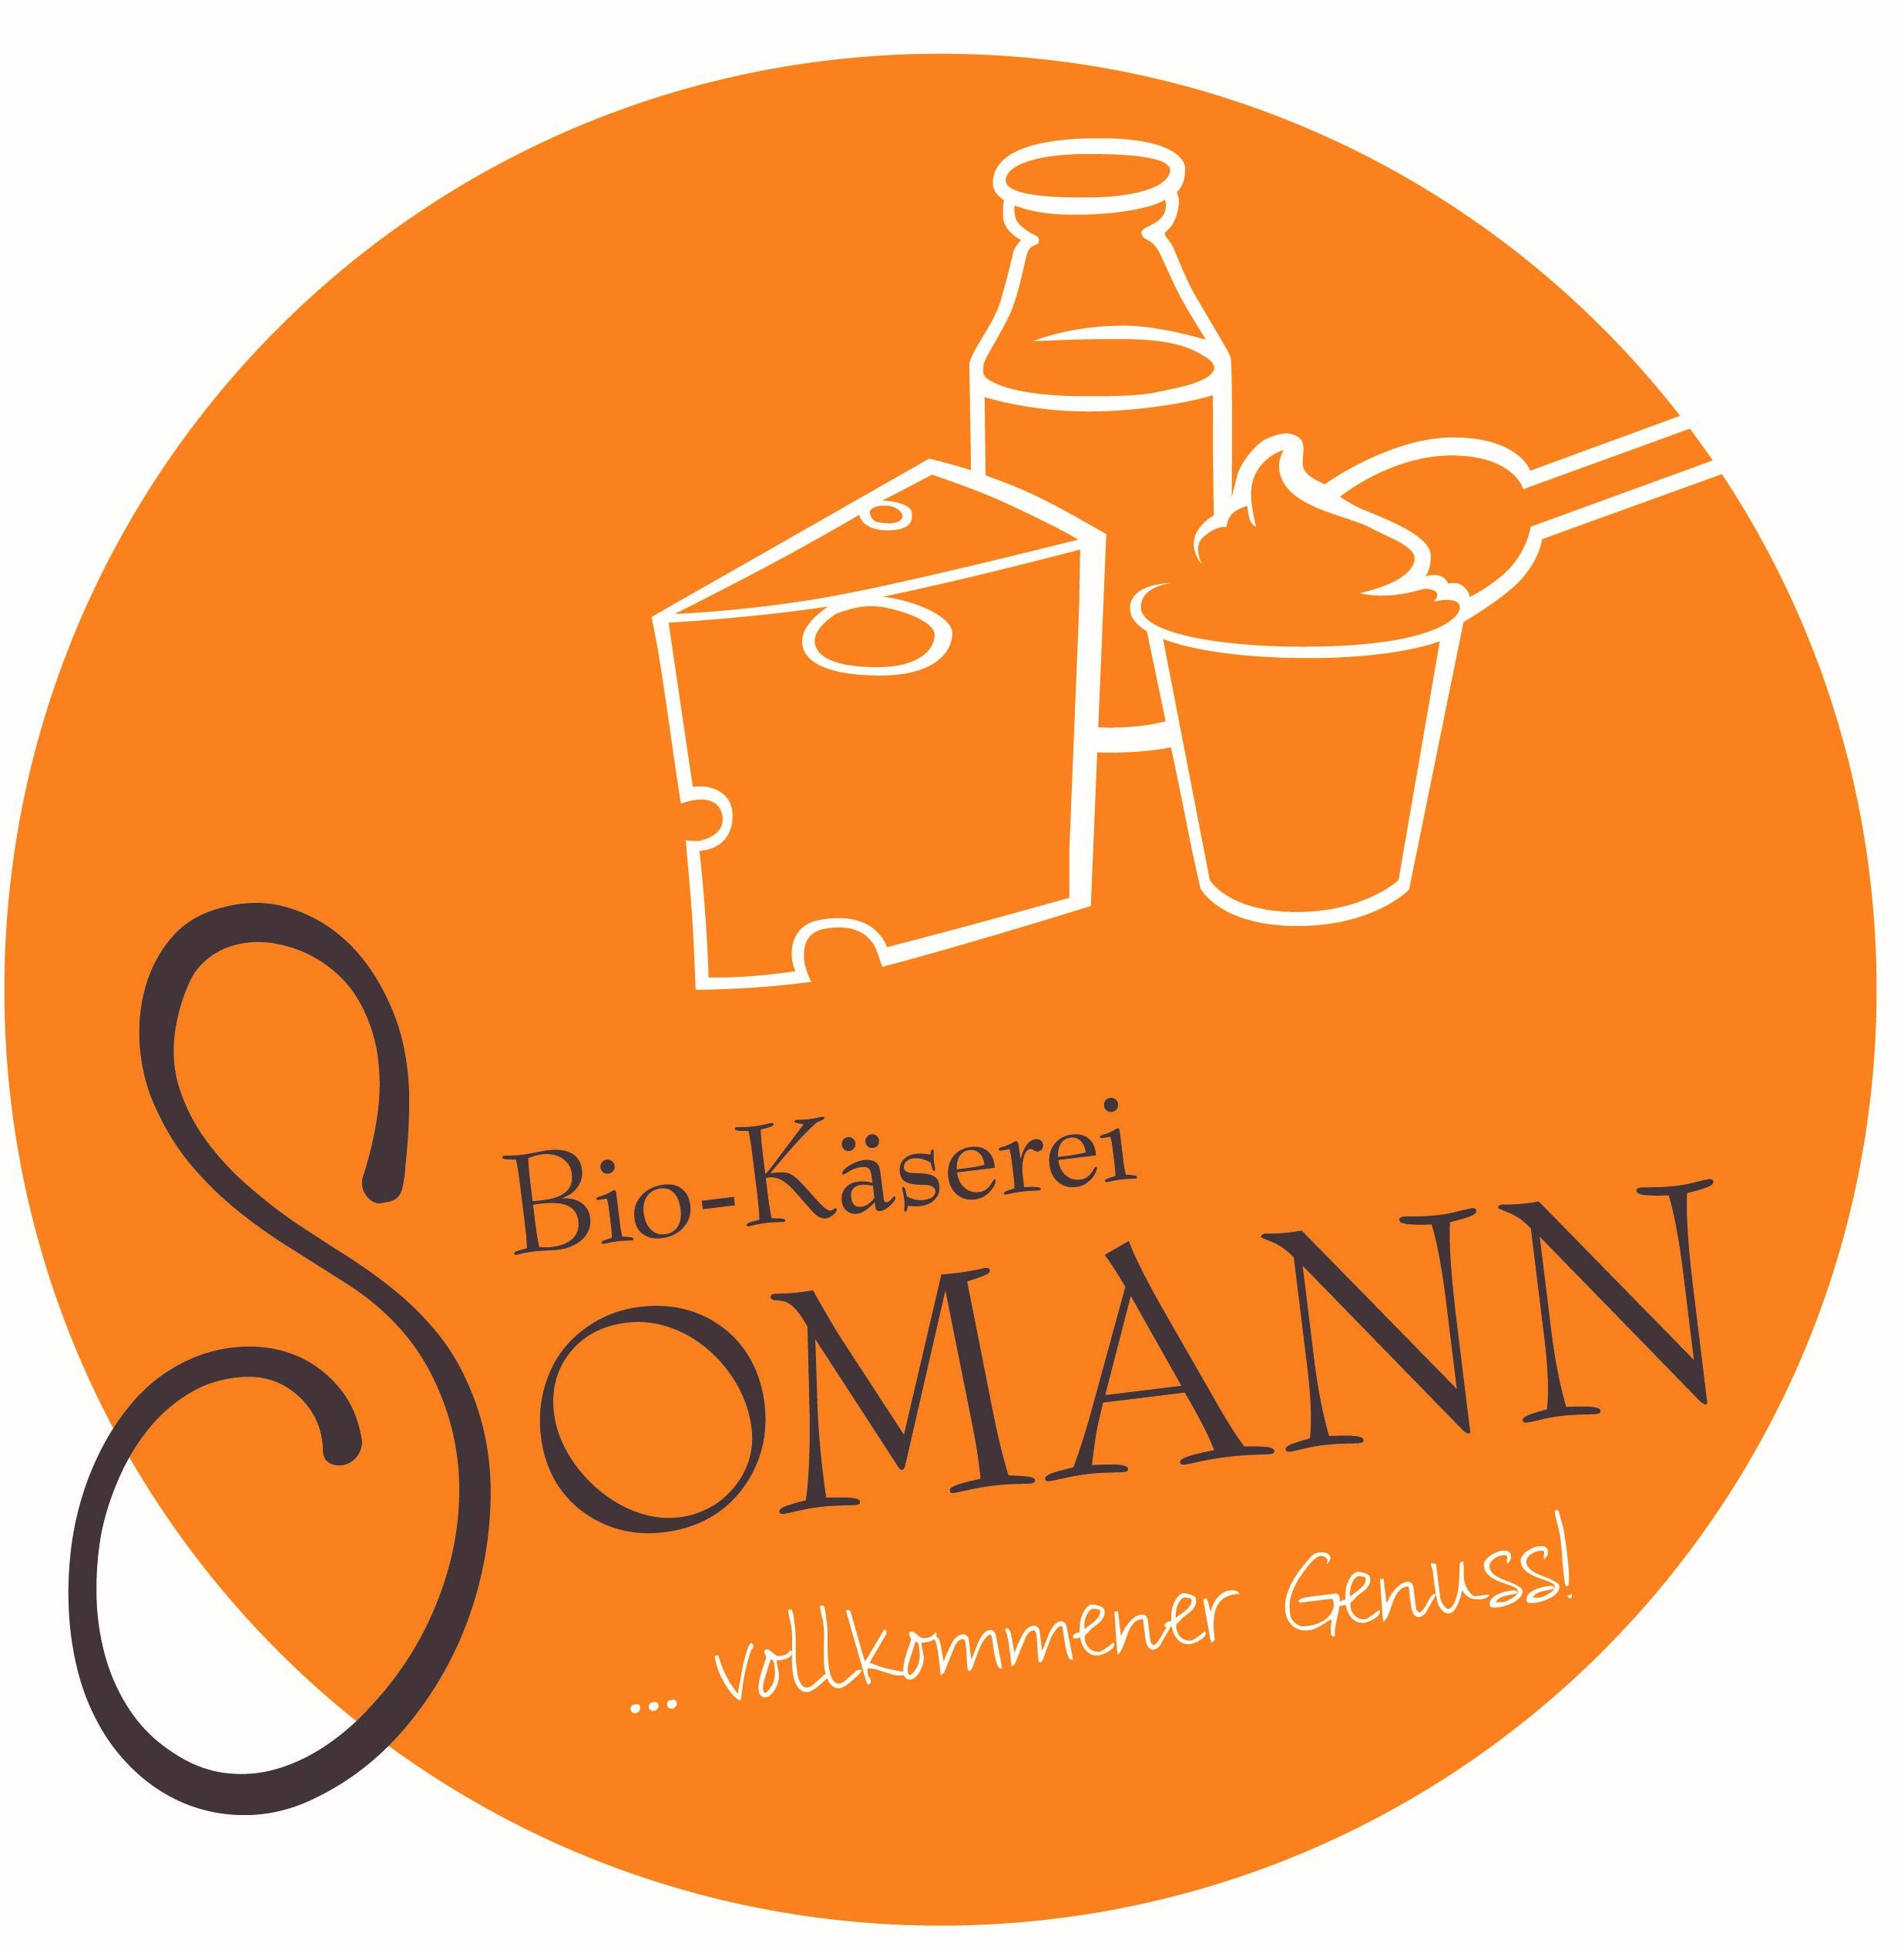 Somann